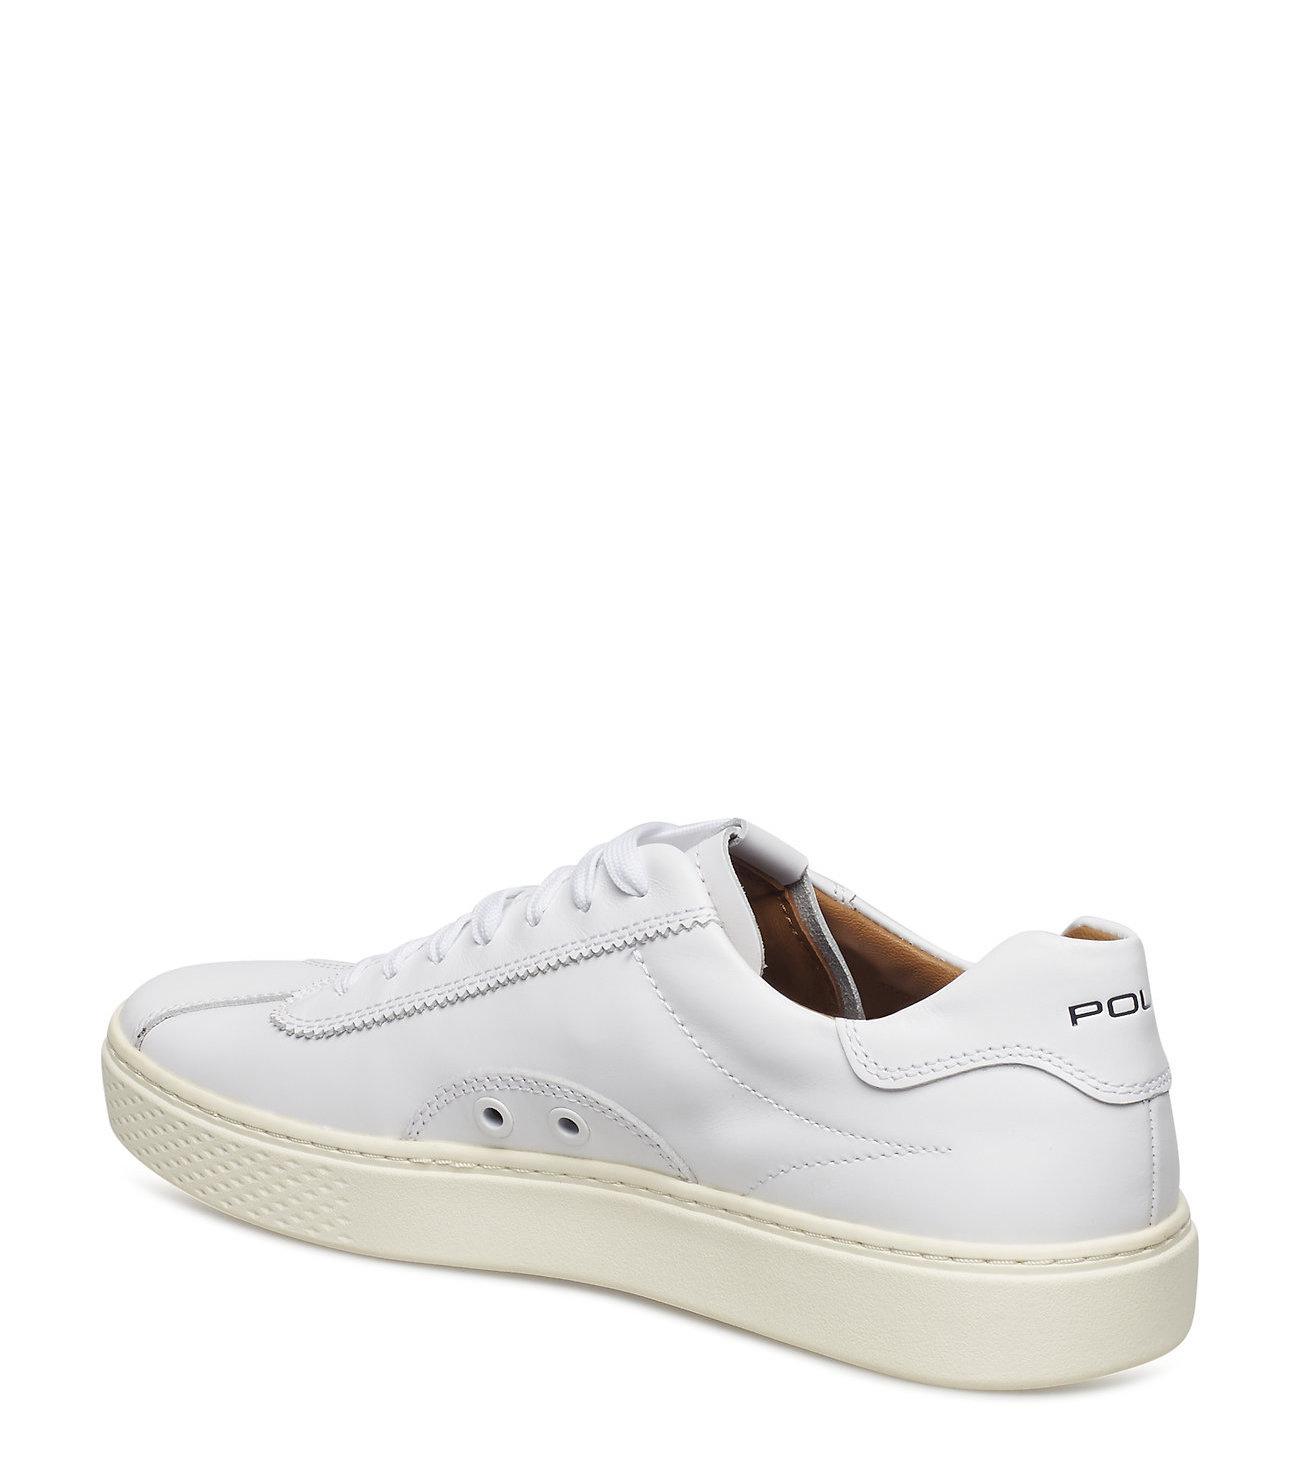 Polo Ralph Lauren leder Sneakers, wit